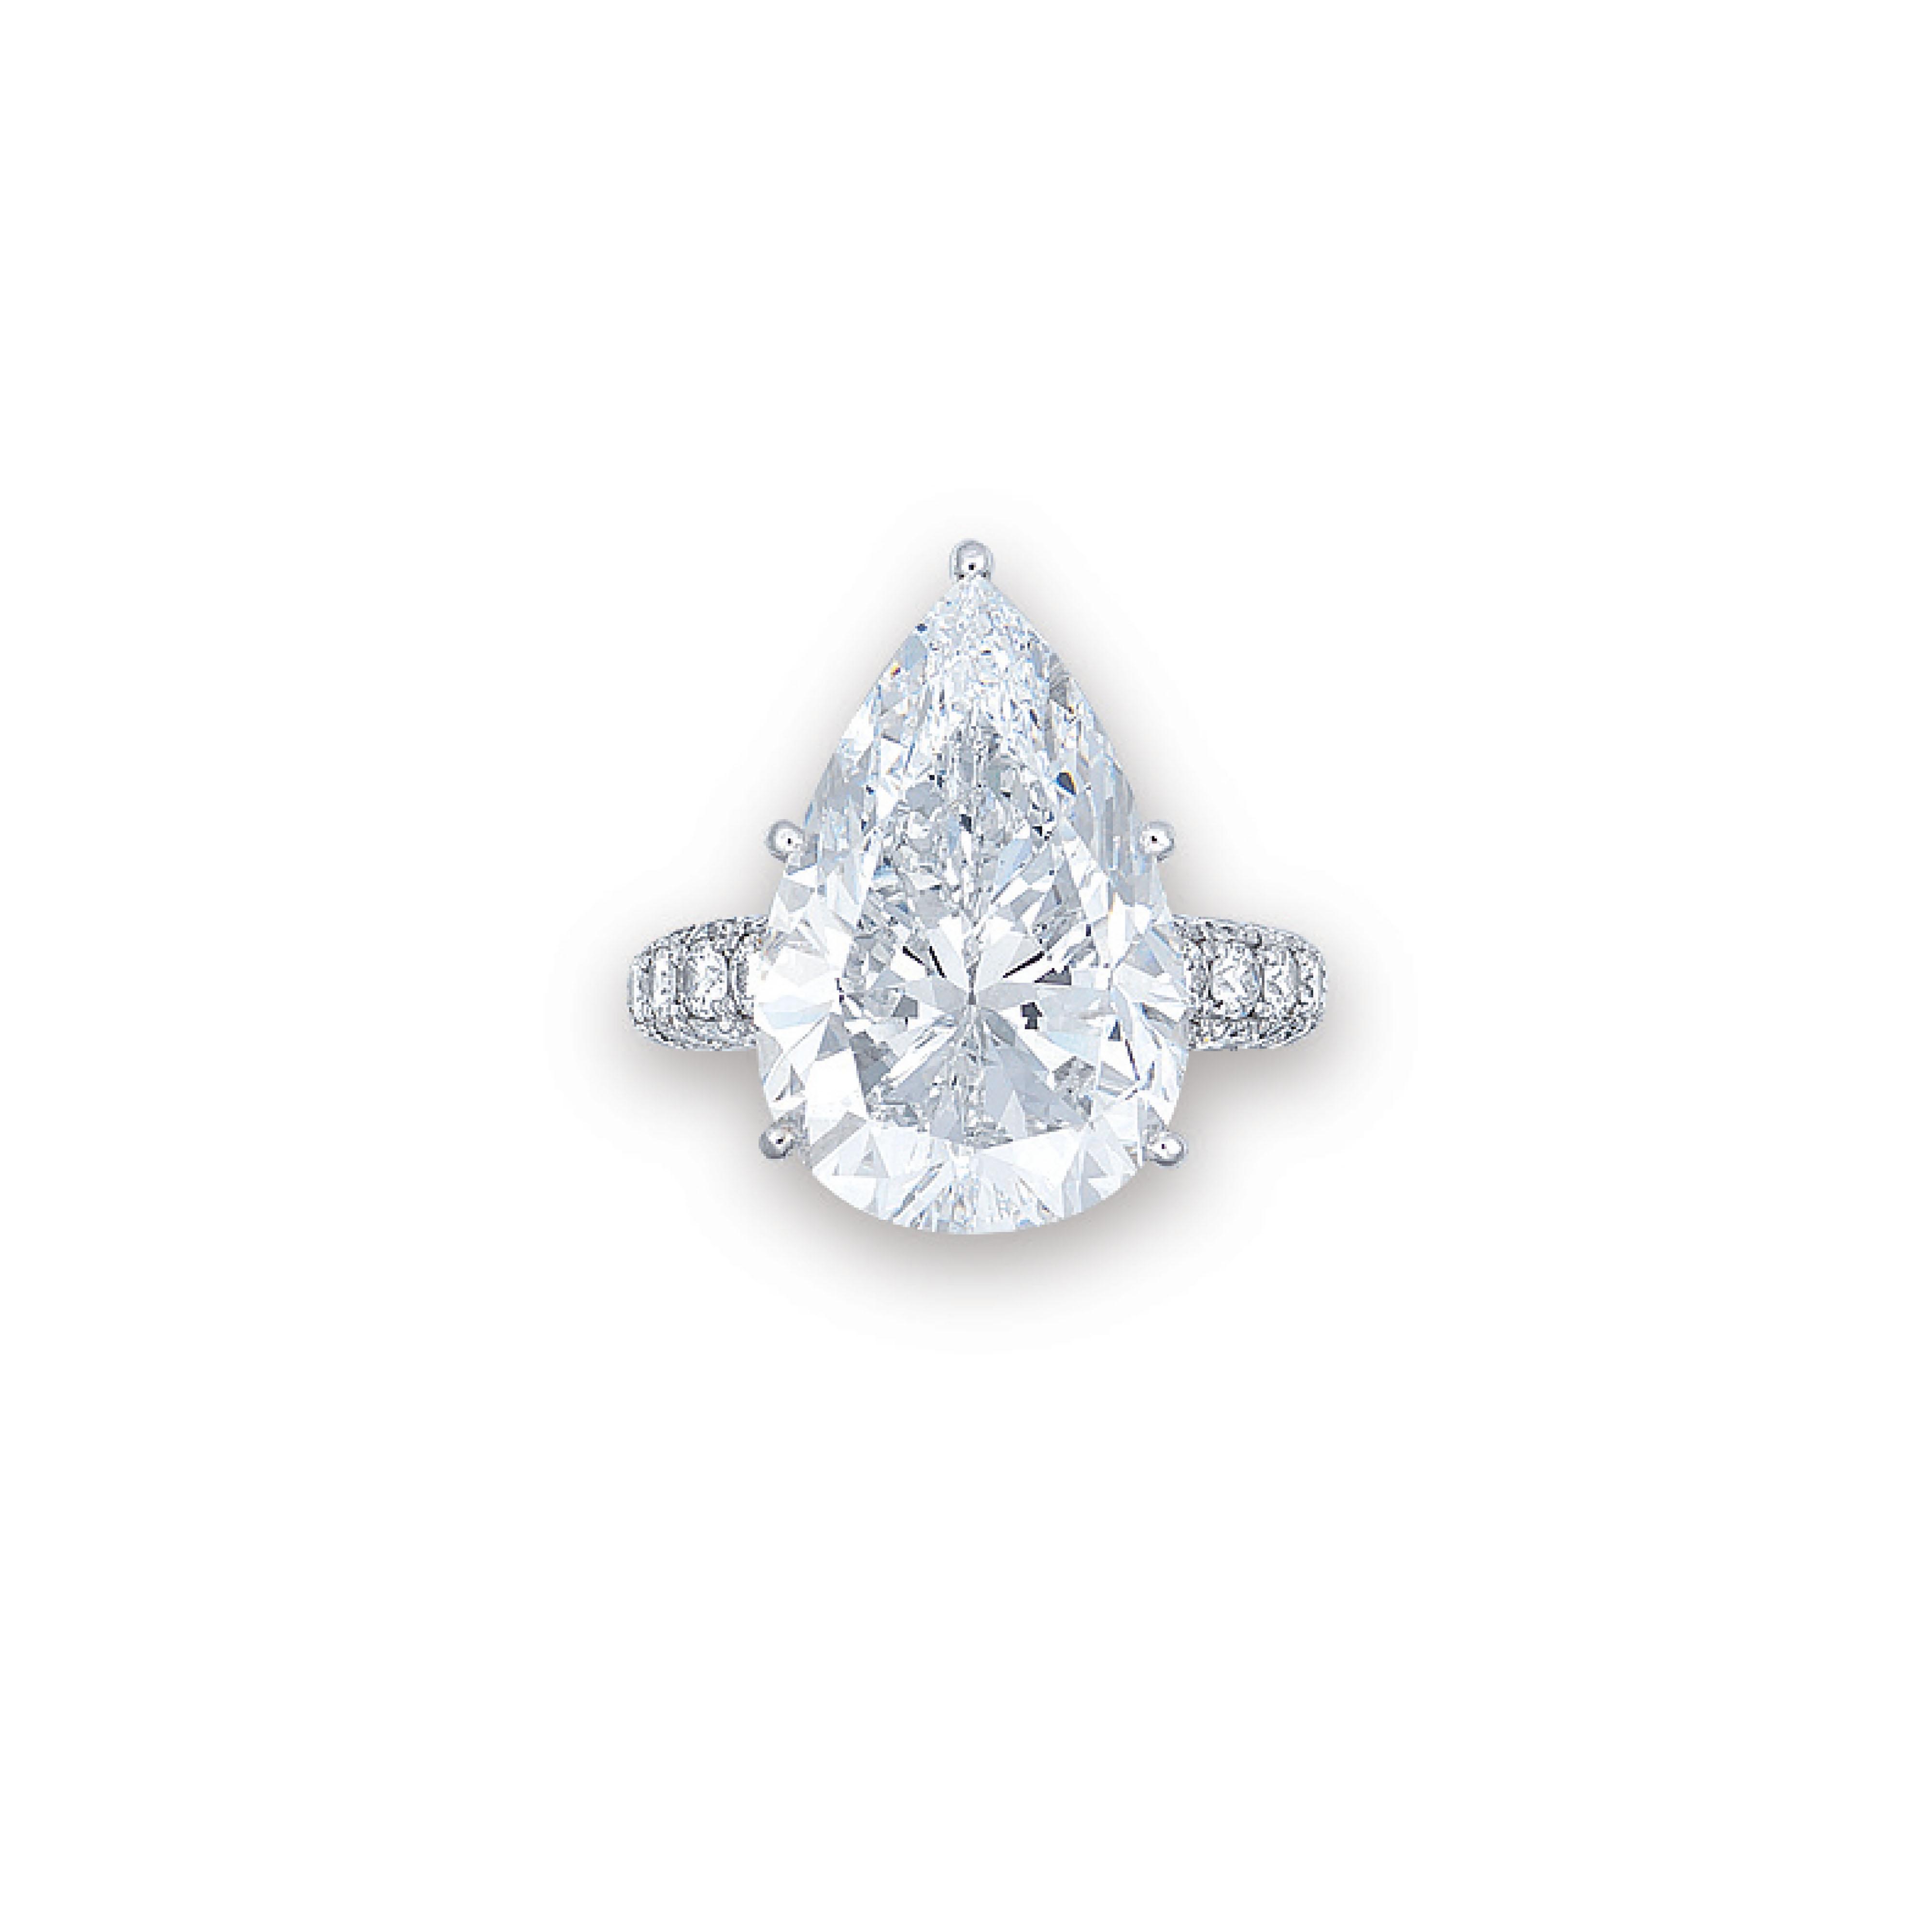 A DIAMOND RING, BY GIMEL